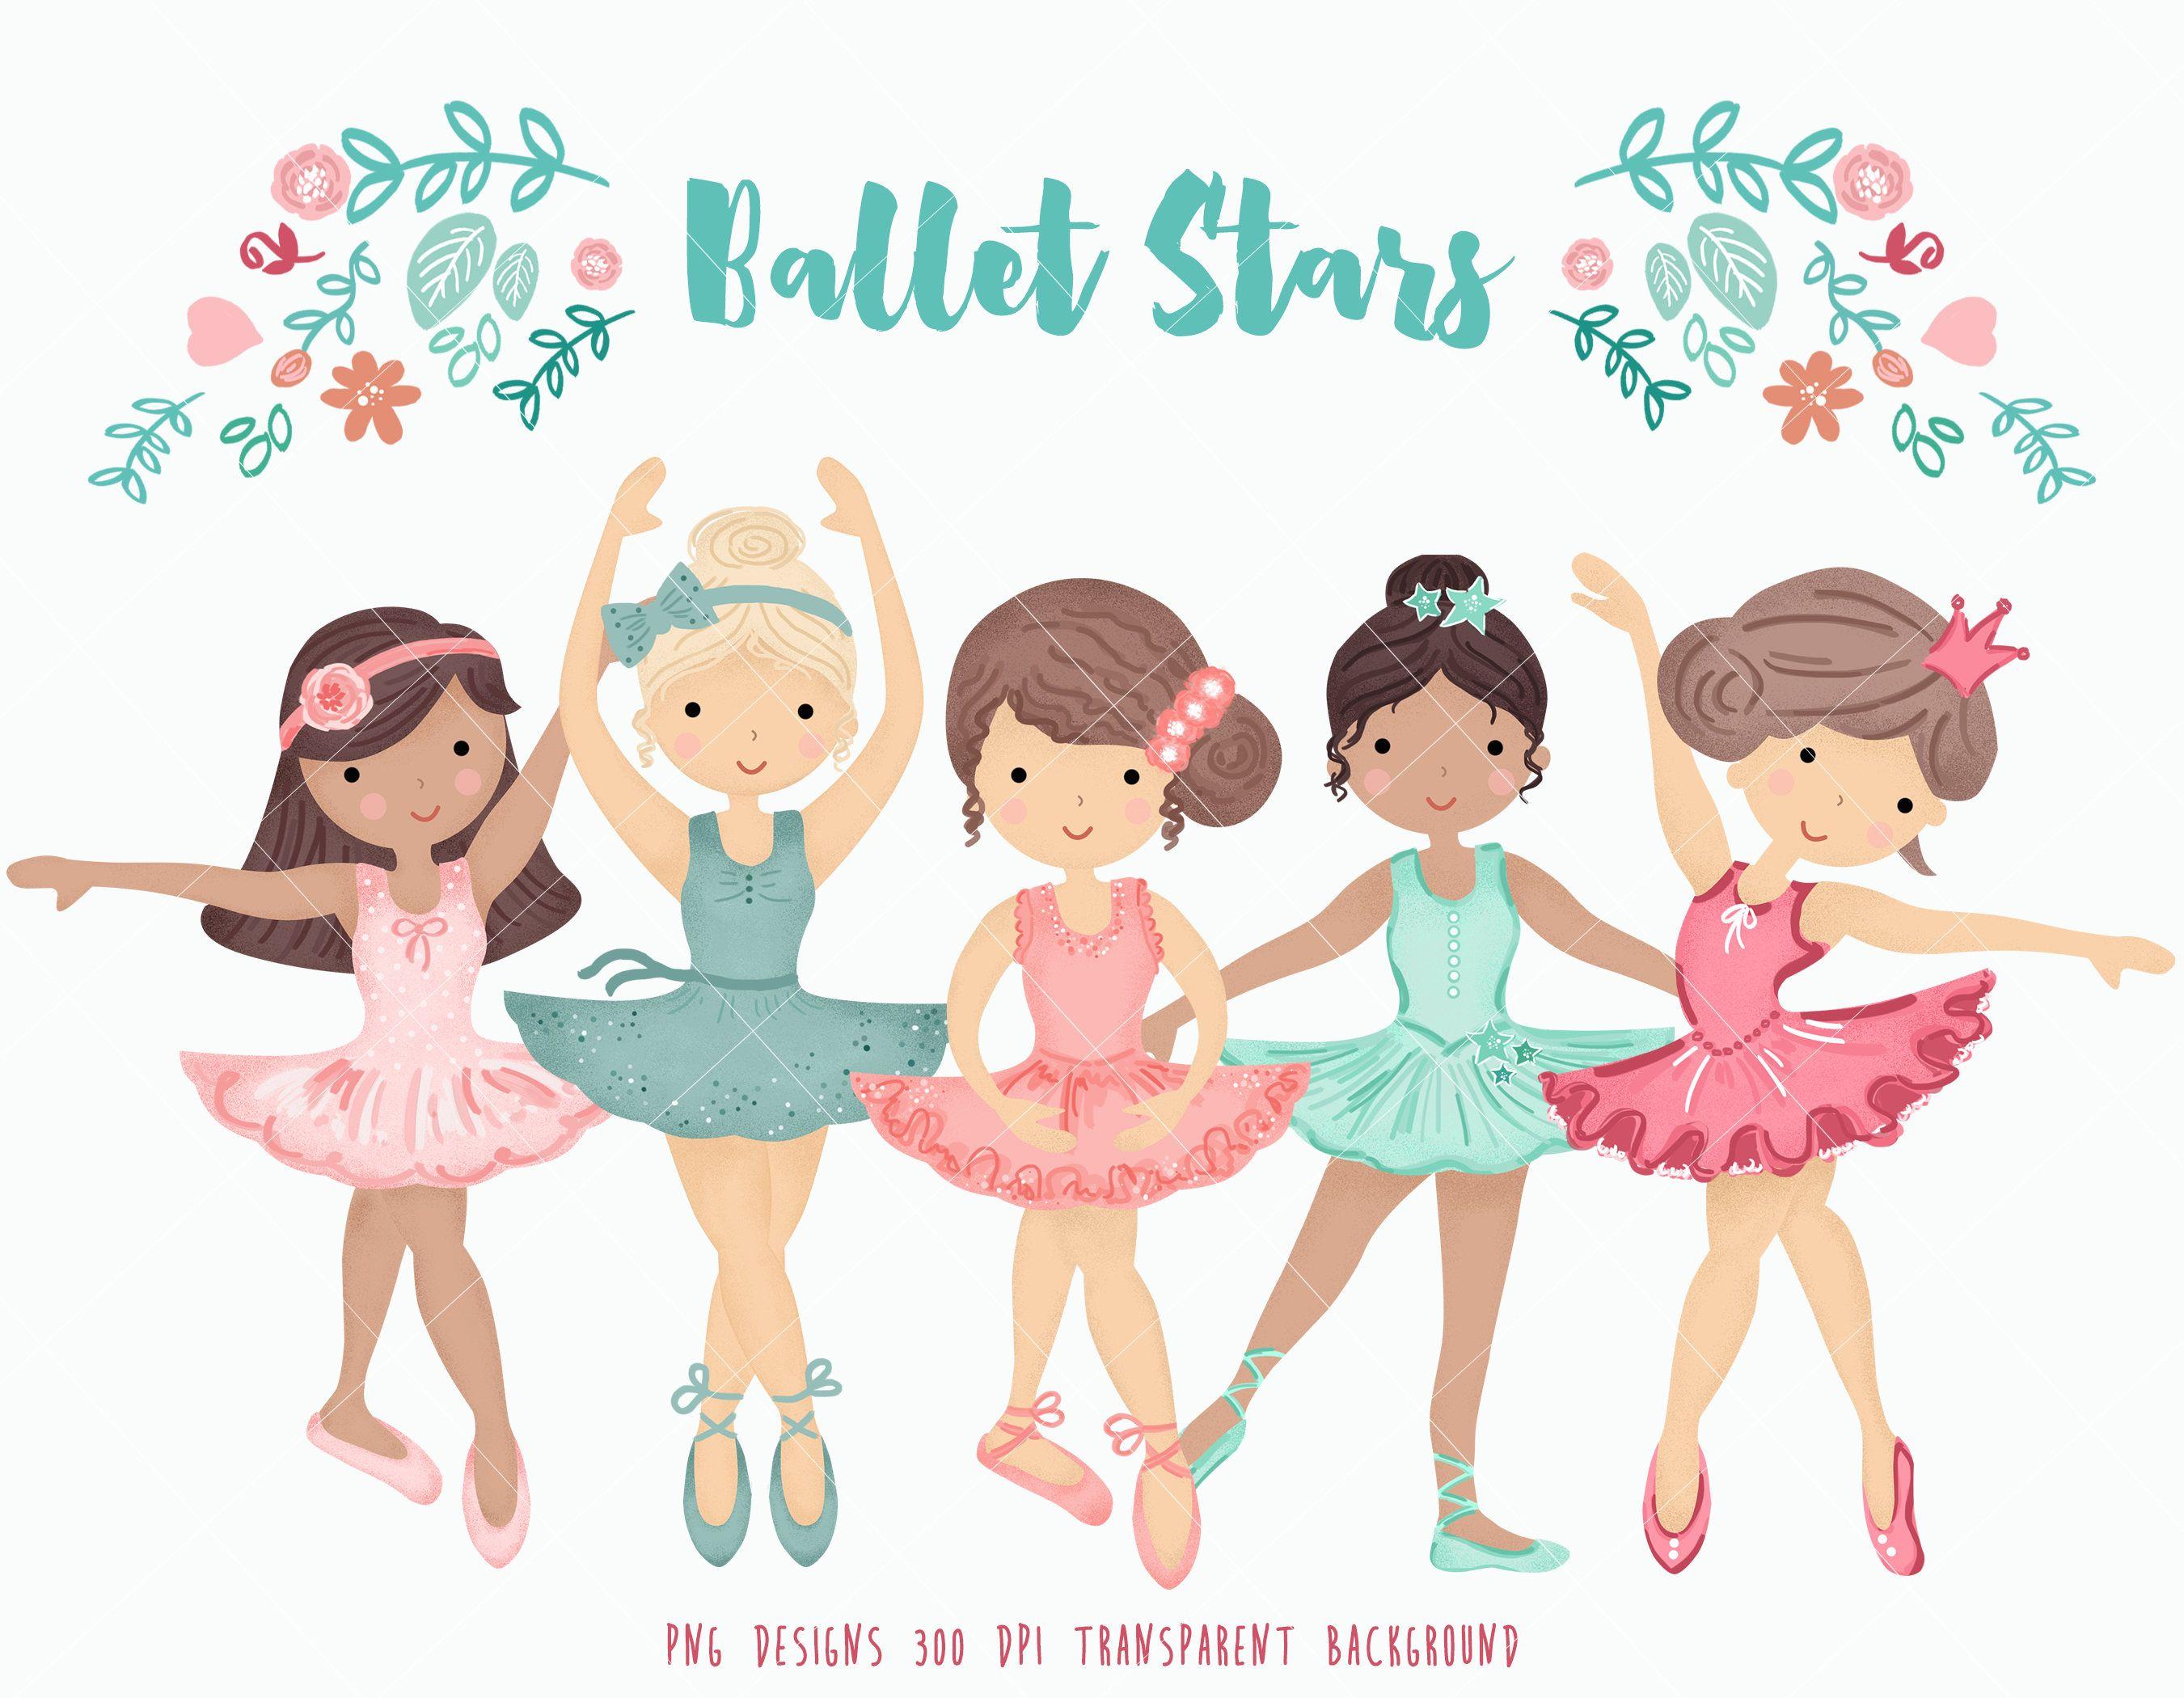 ballerina clipart little ballerinas clip art ballet graphic dancing girl ballet illustration prima ballerina dancer hand drawn art [ 2701 x 2100 Pixel ]